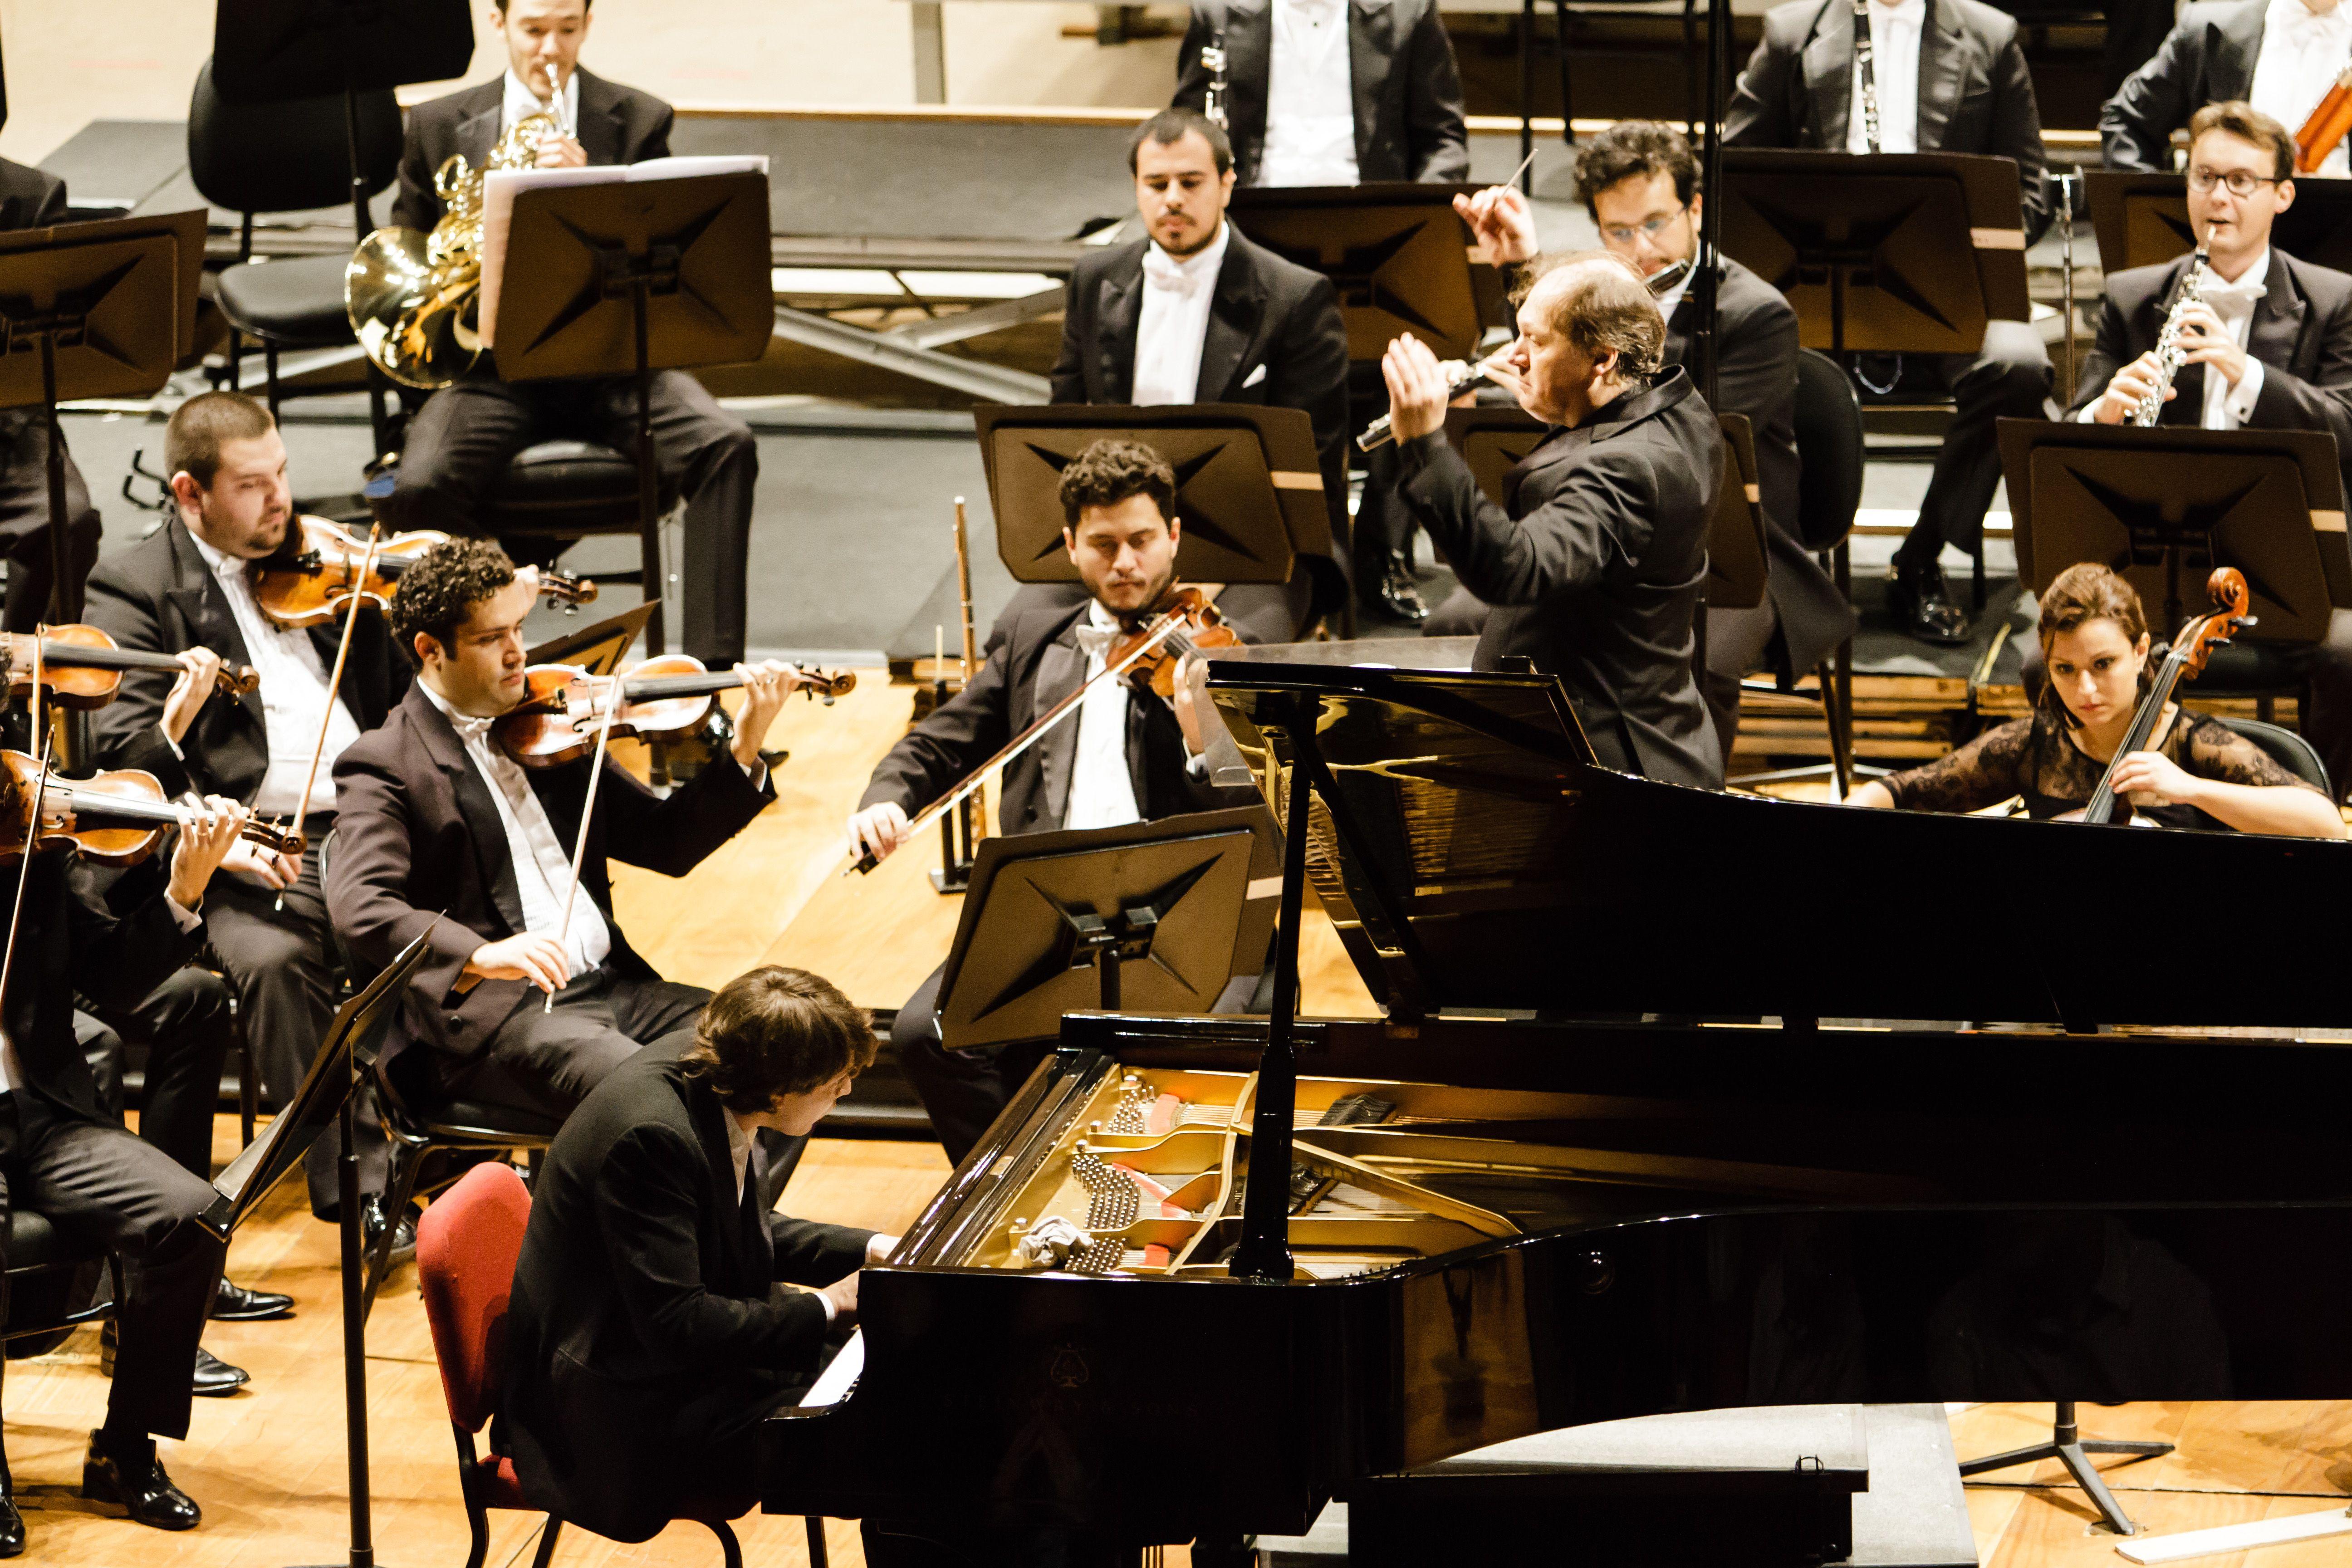 David Fray, piano | Roberto Minczuk, regência - Orquestra Sinfônica Brasileira. Foto: Cicero Rodrigues